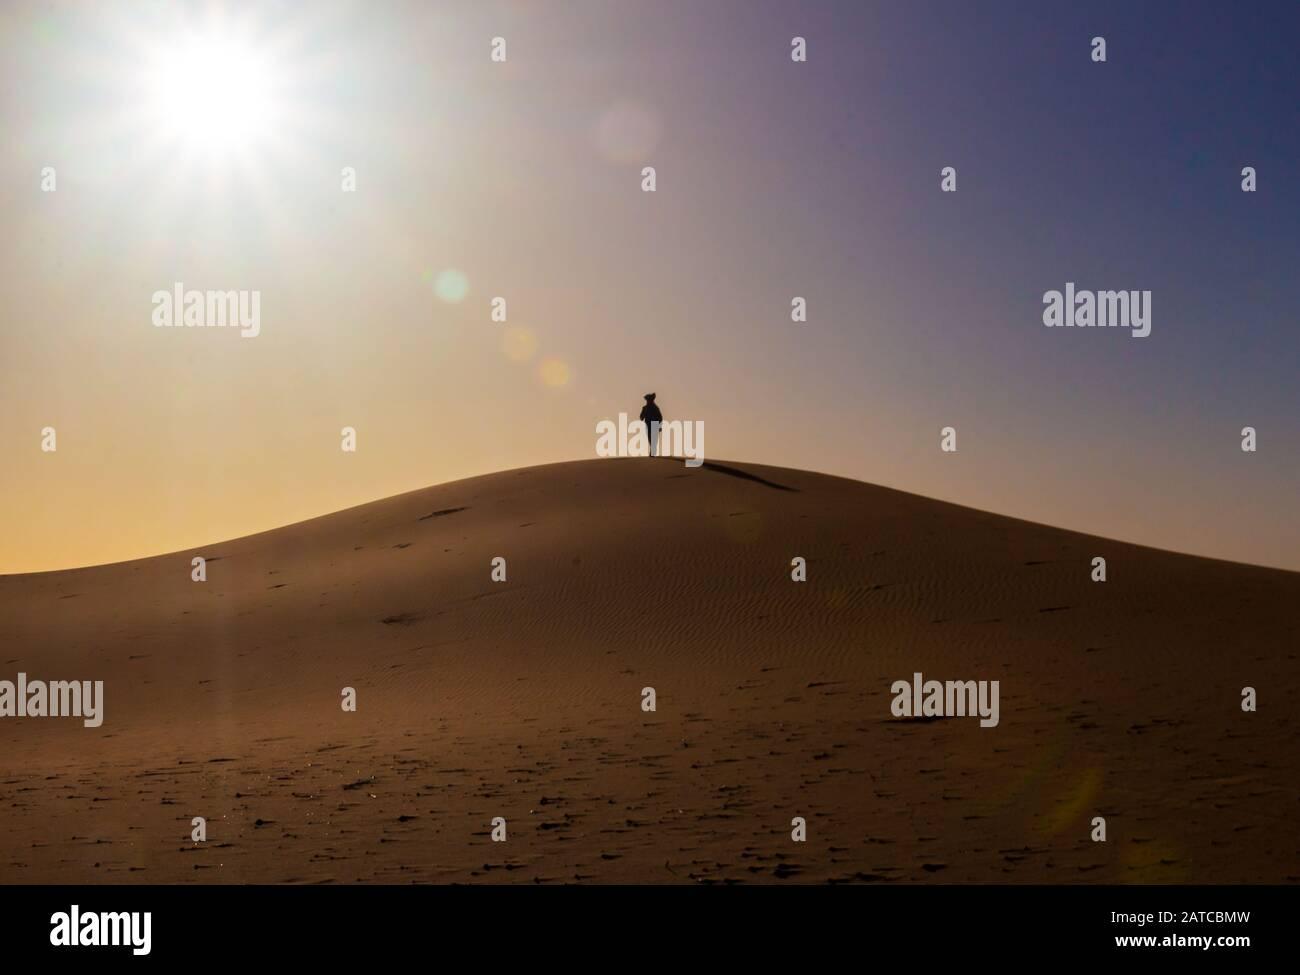 Tuareg nel deserto del Sahara, Marocco Foto Stock